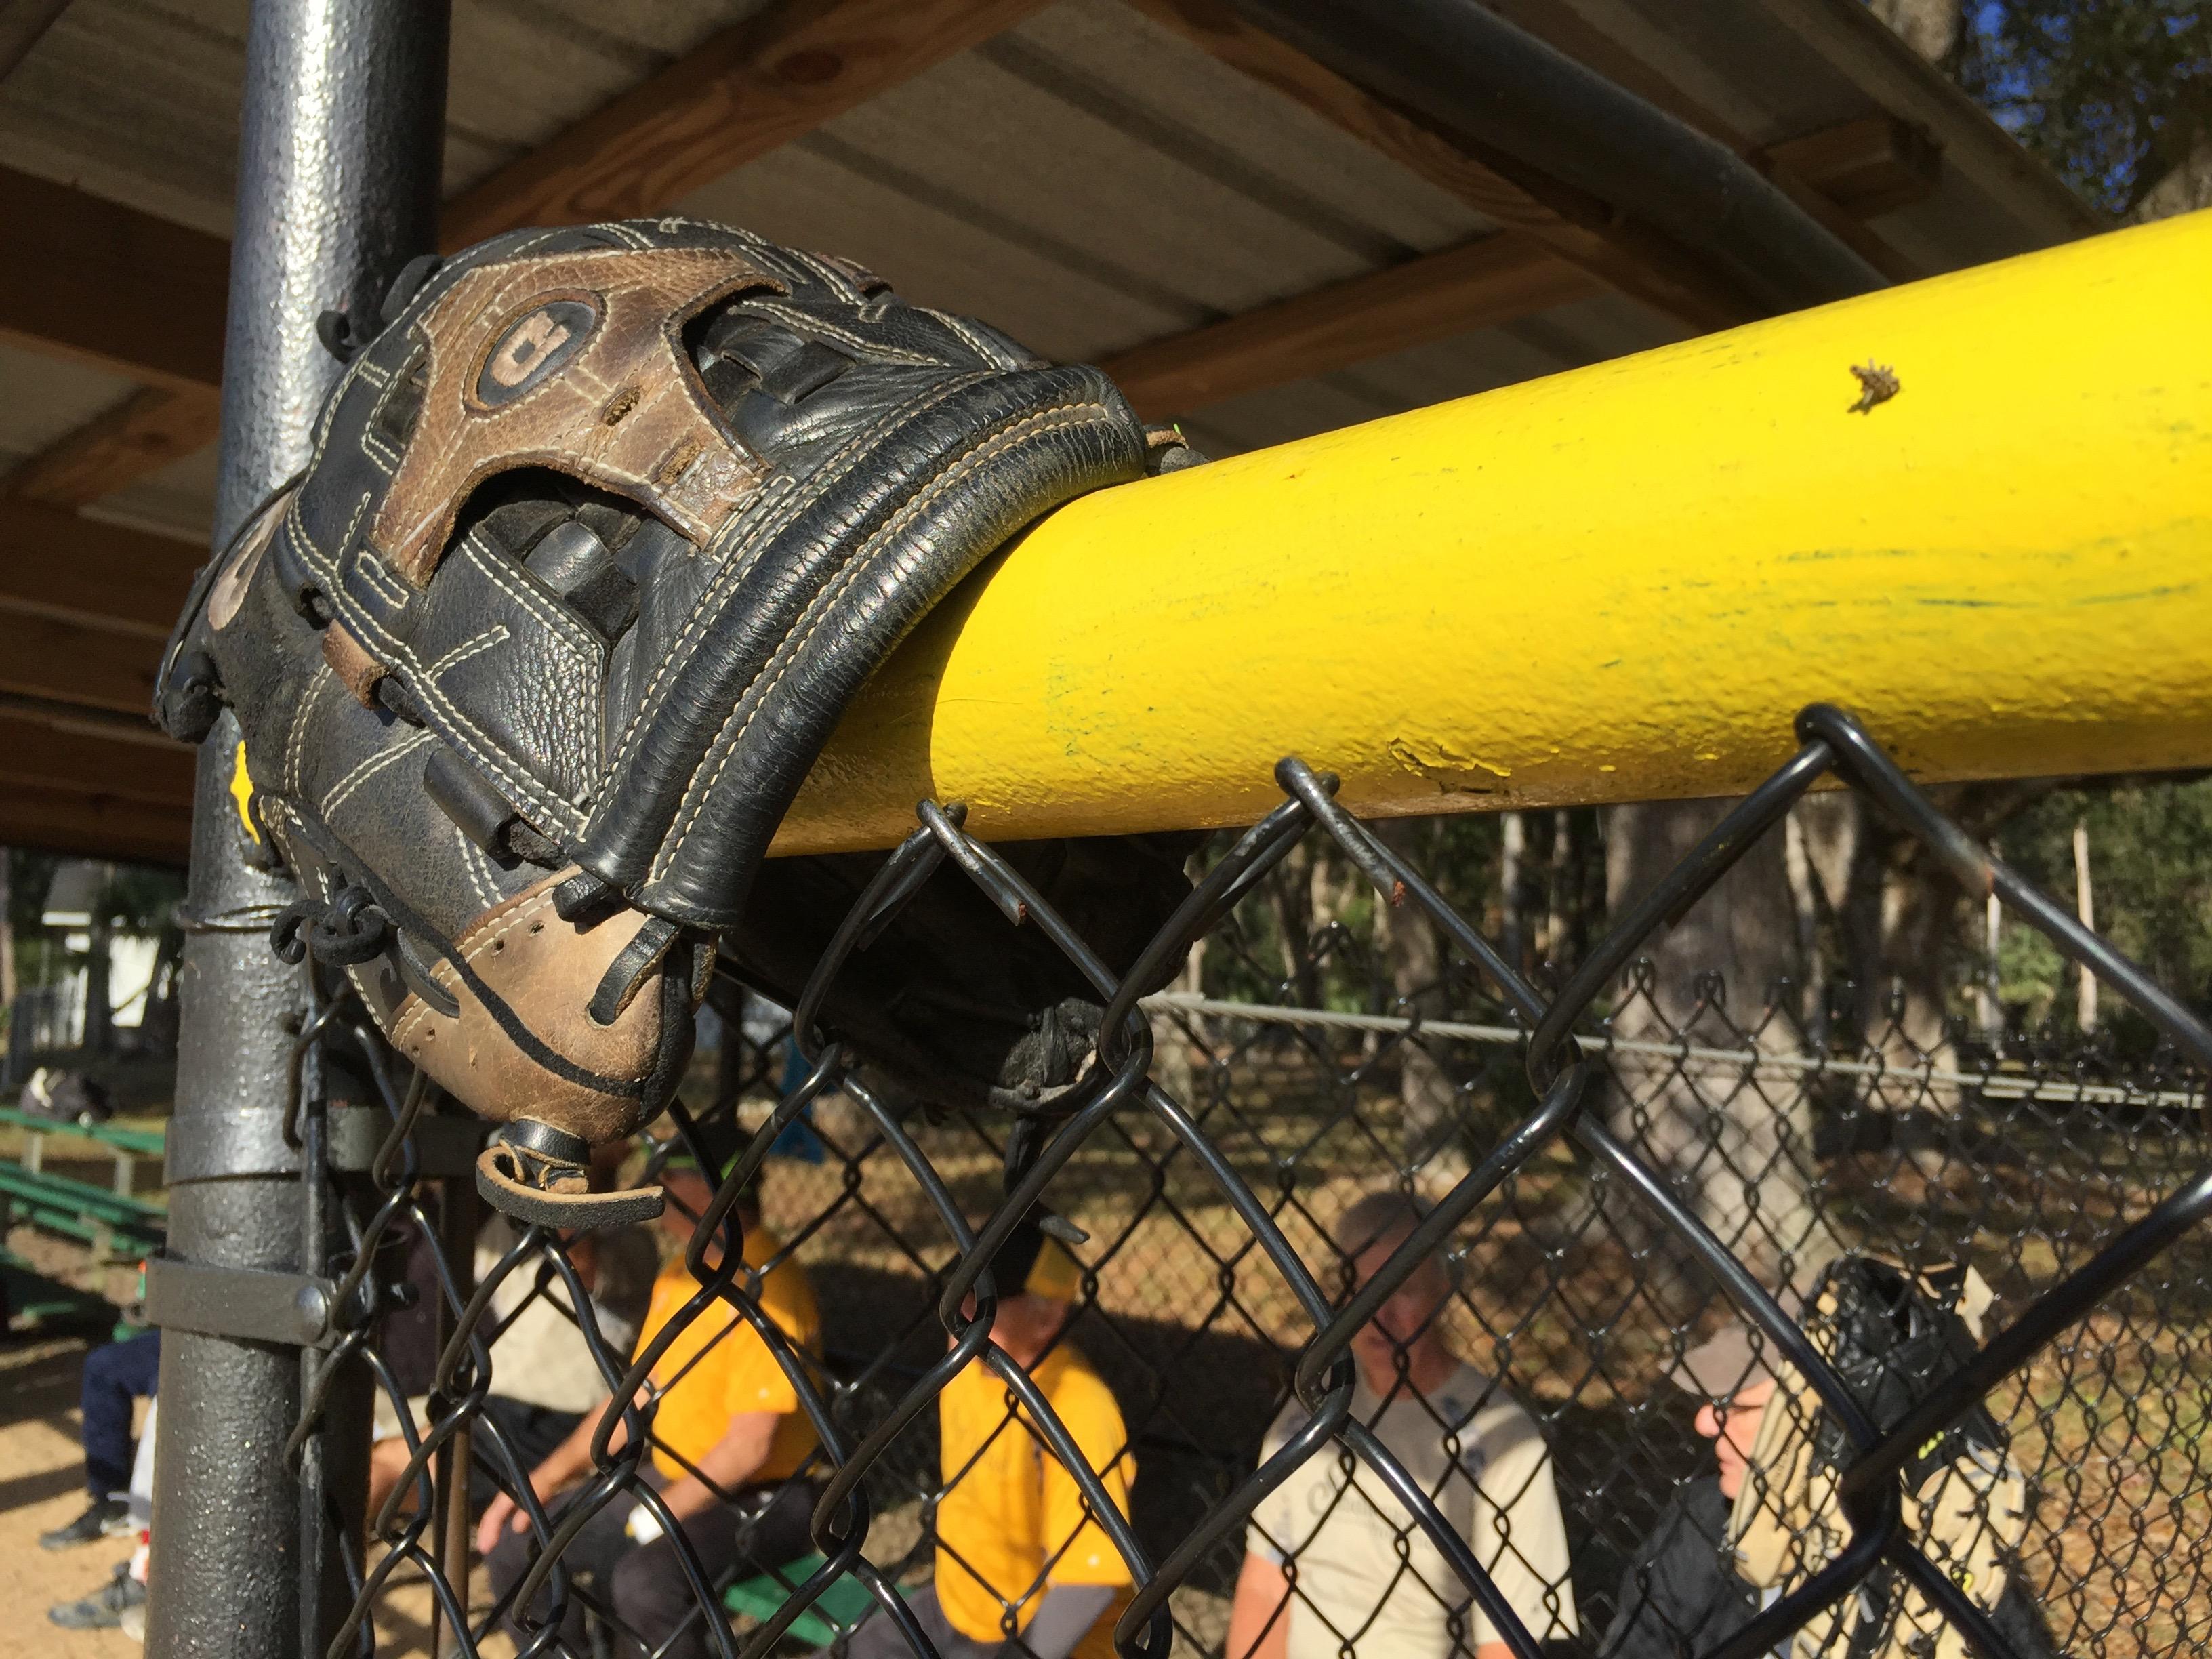 About Ocala Senior Softball – Ocala Senior Softball